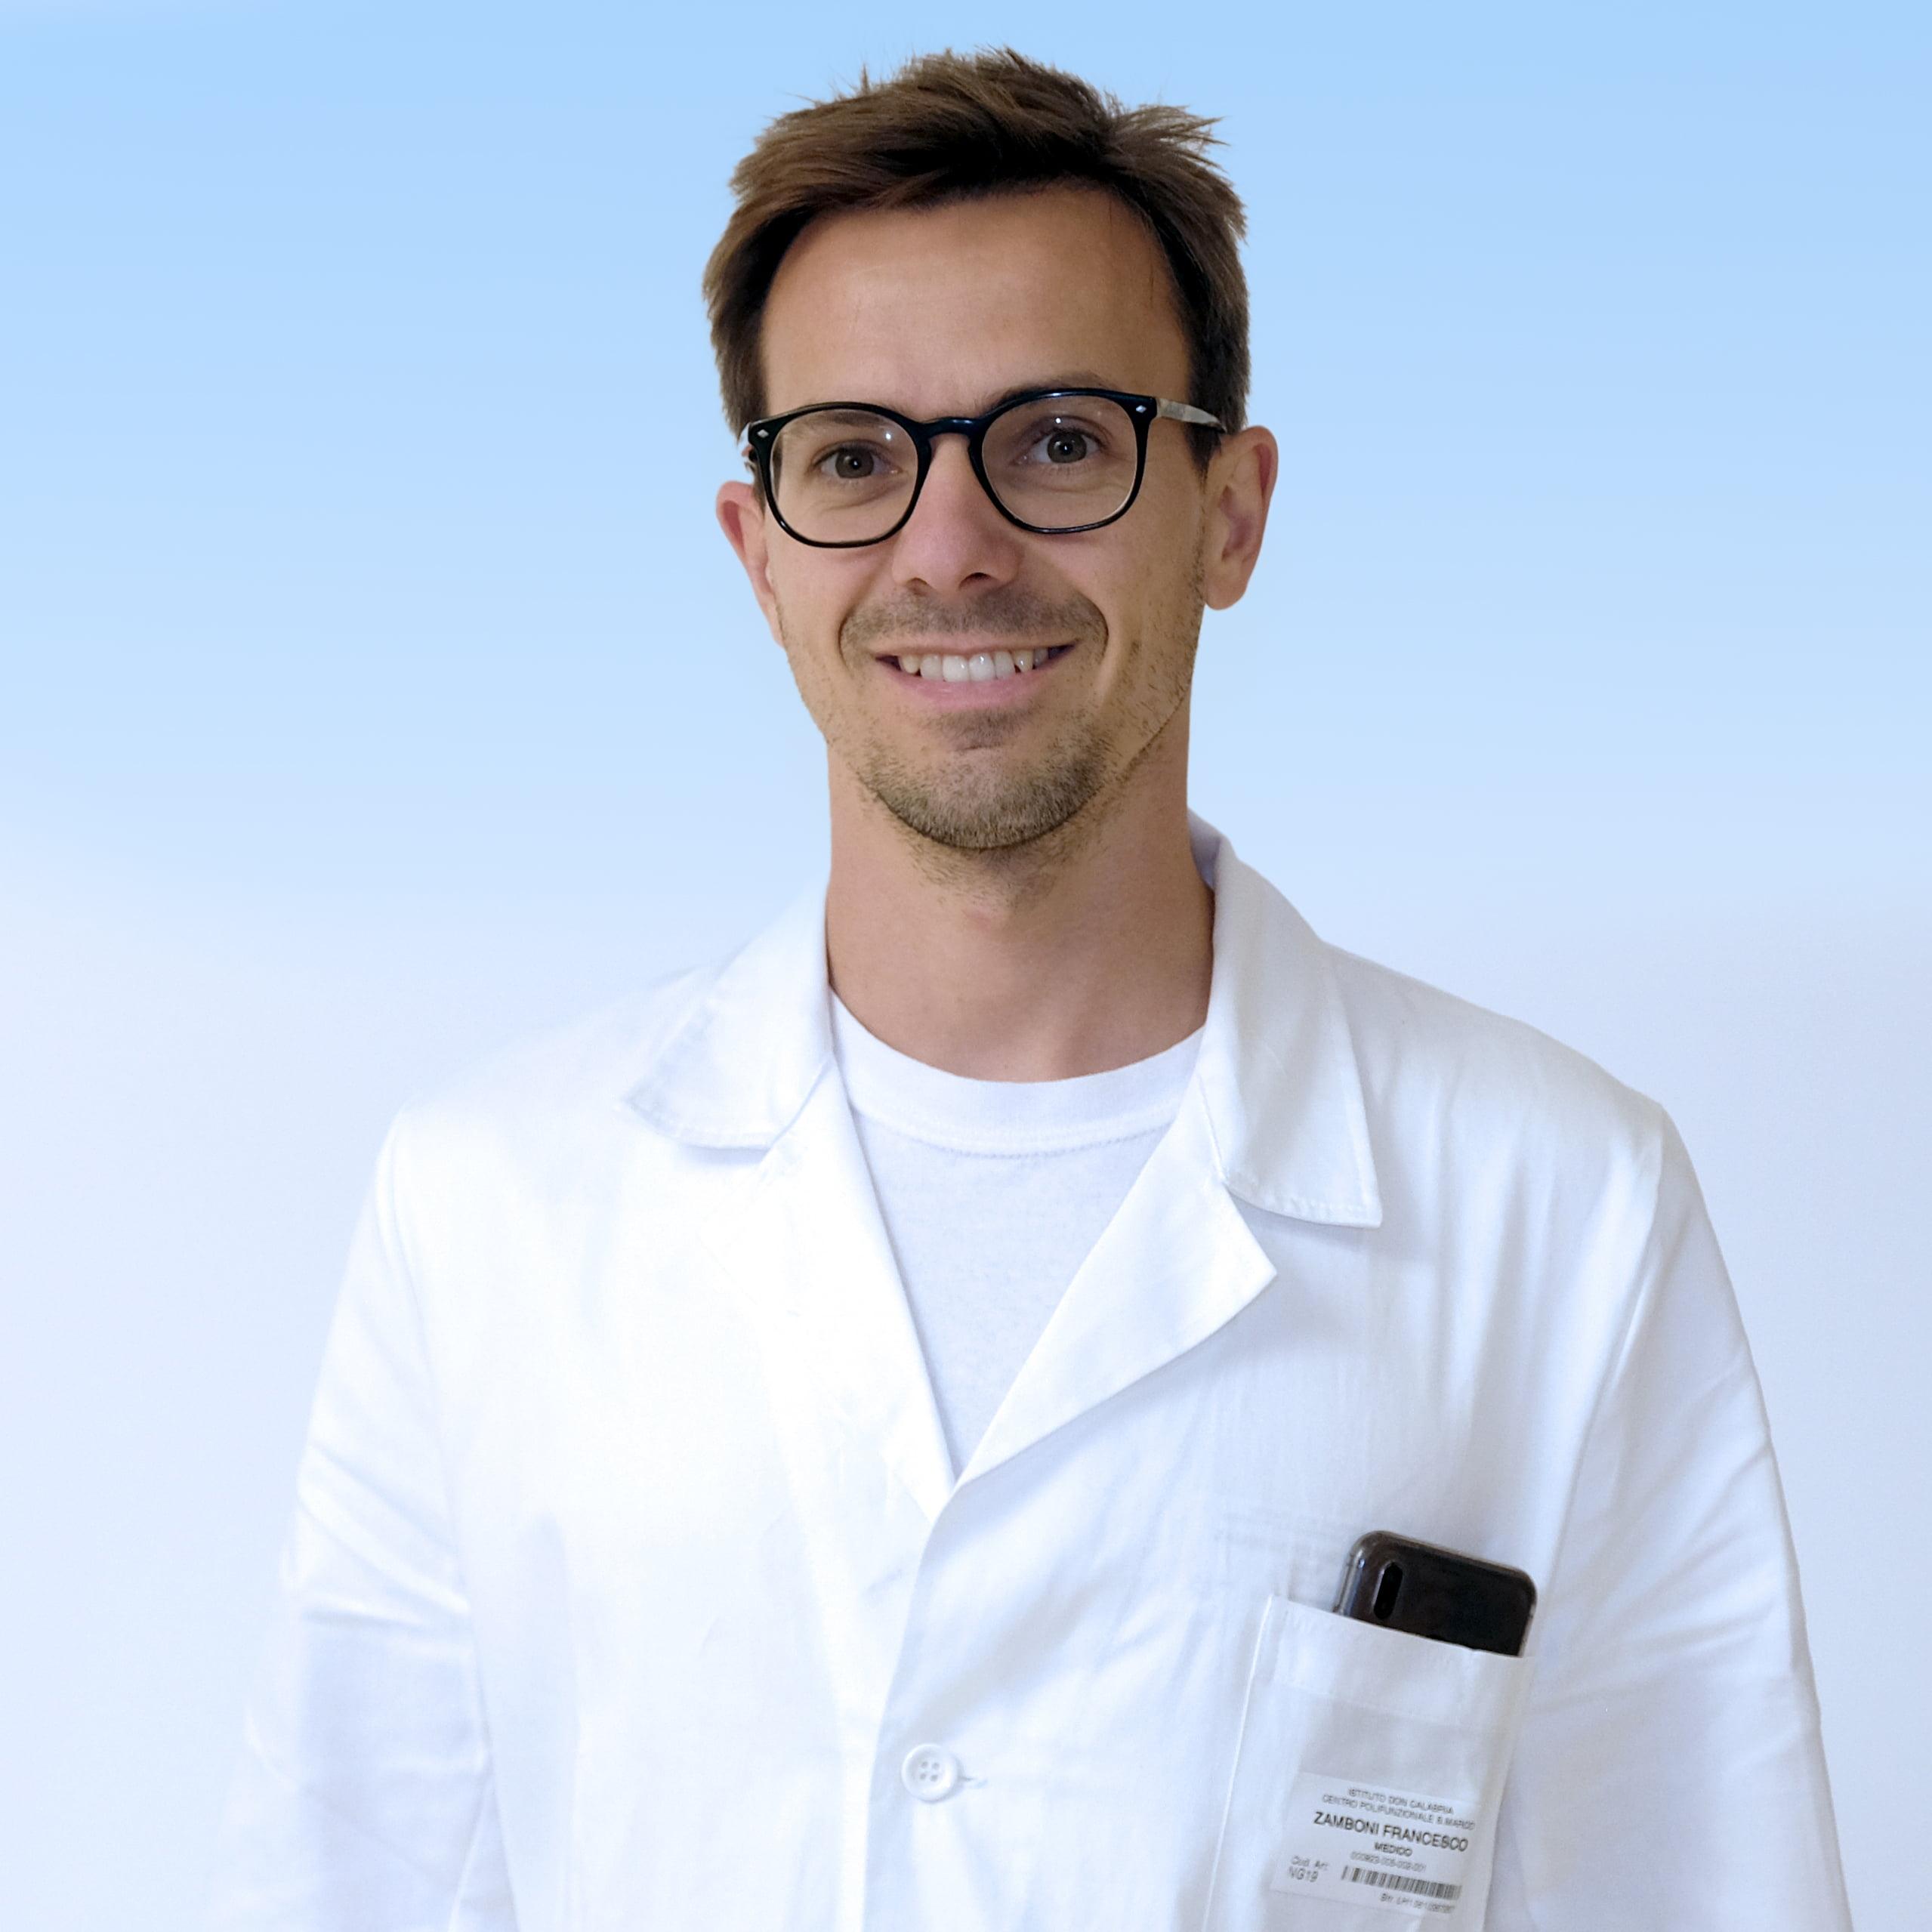 Francesco Zamboni, radiologo IRCCS Ospedale Sacro Cuore Don Calabria